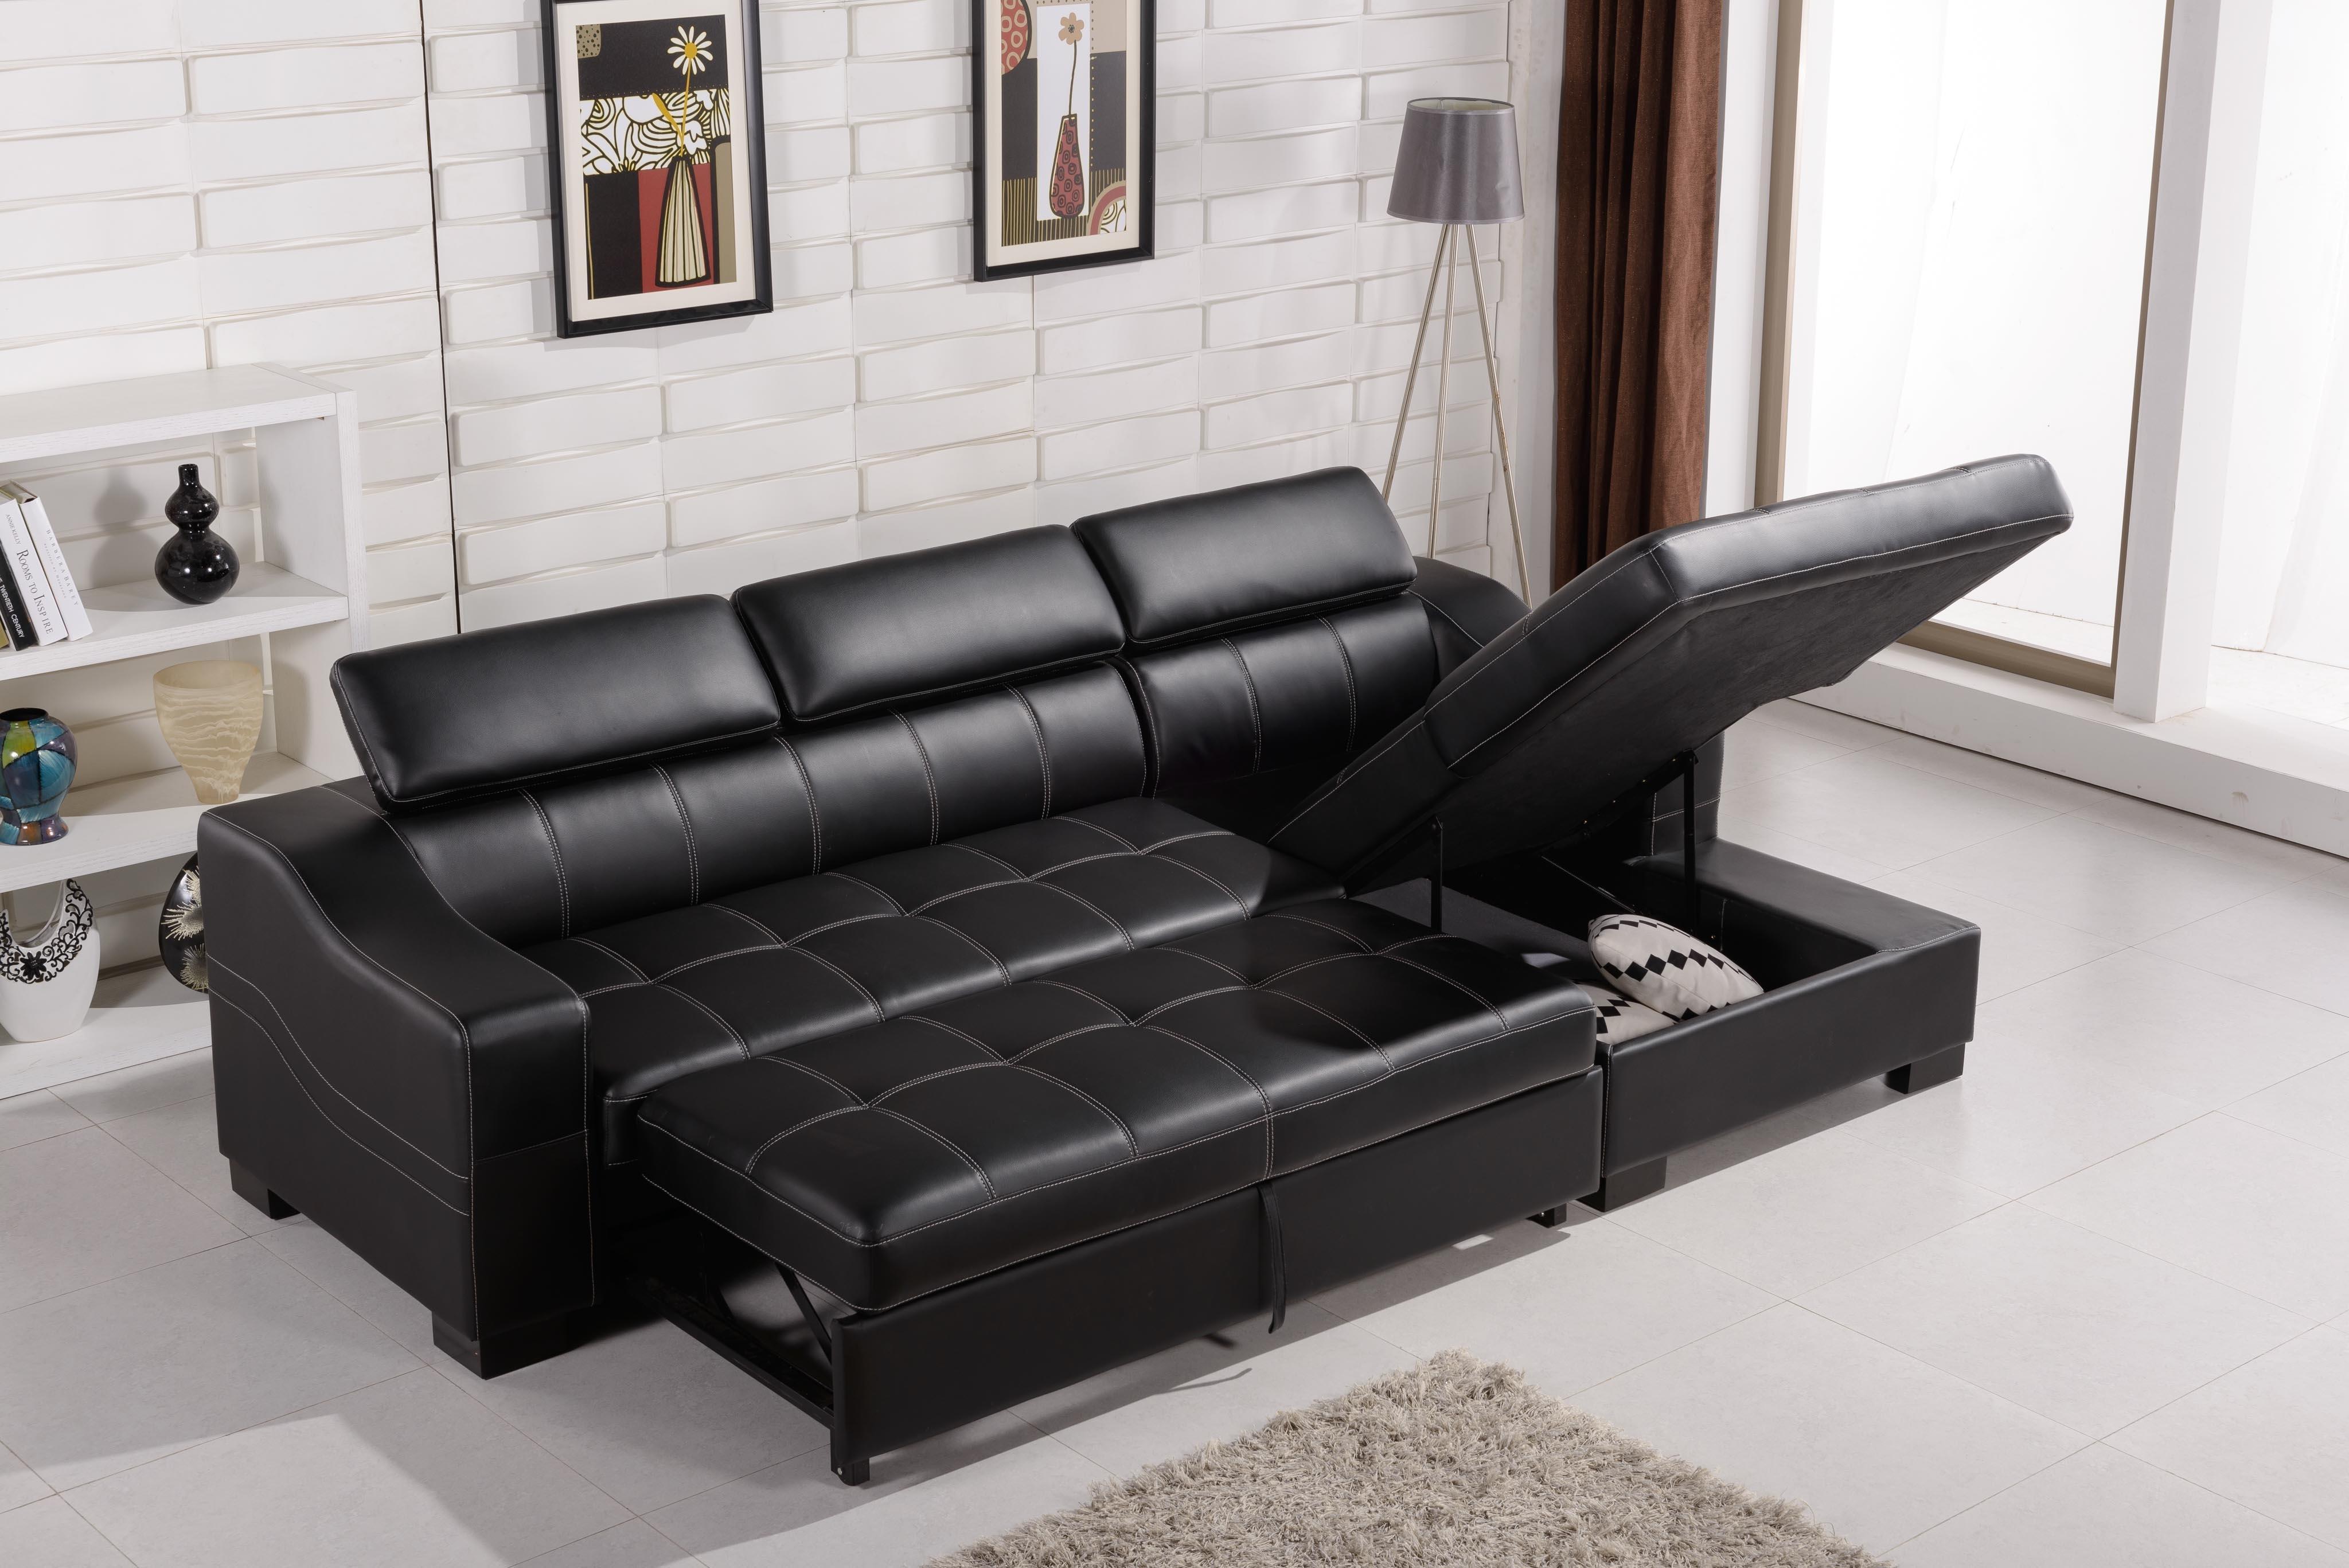 Furniture : Ebay Ethan Allen Sofa Table Chesterfield Sofa Bed Velvet For Kijiji Kitchener Sectional Sofas (View 8 of 10)